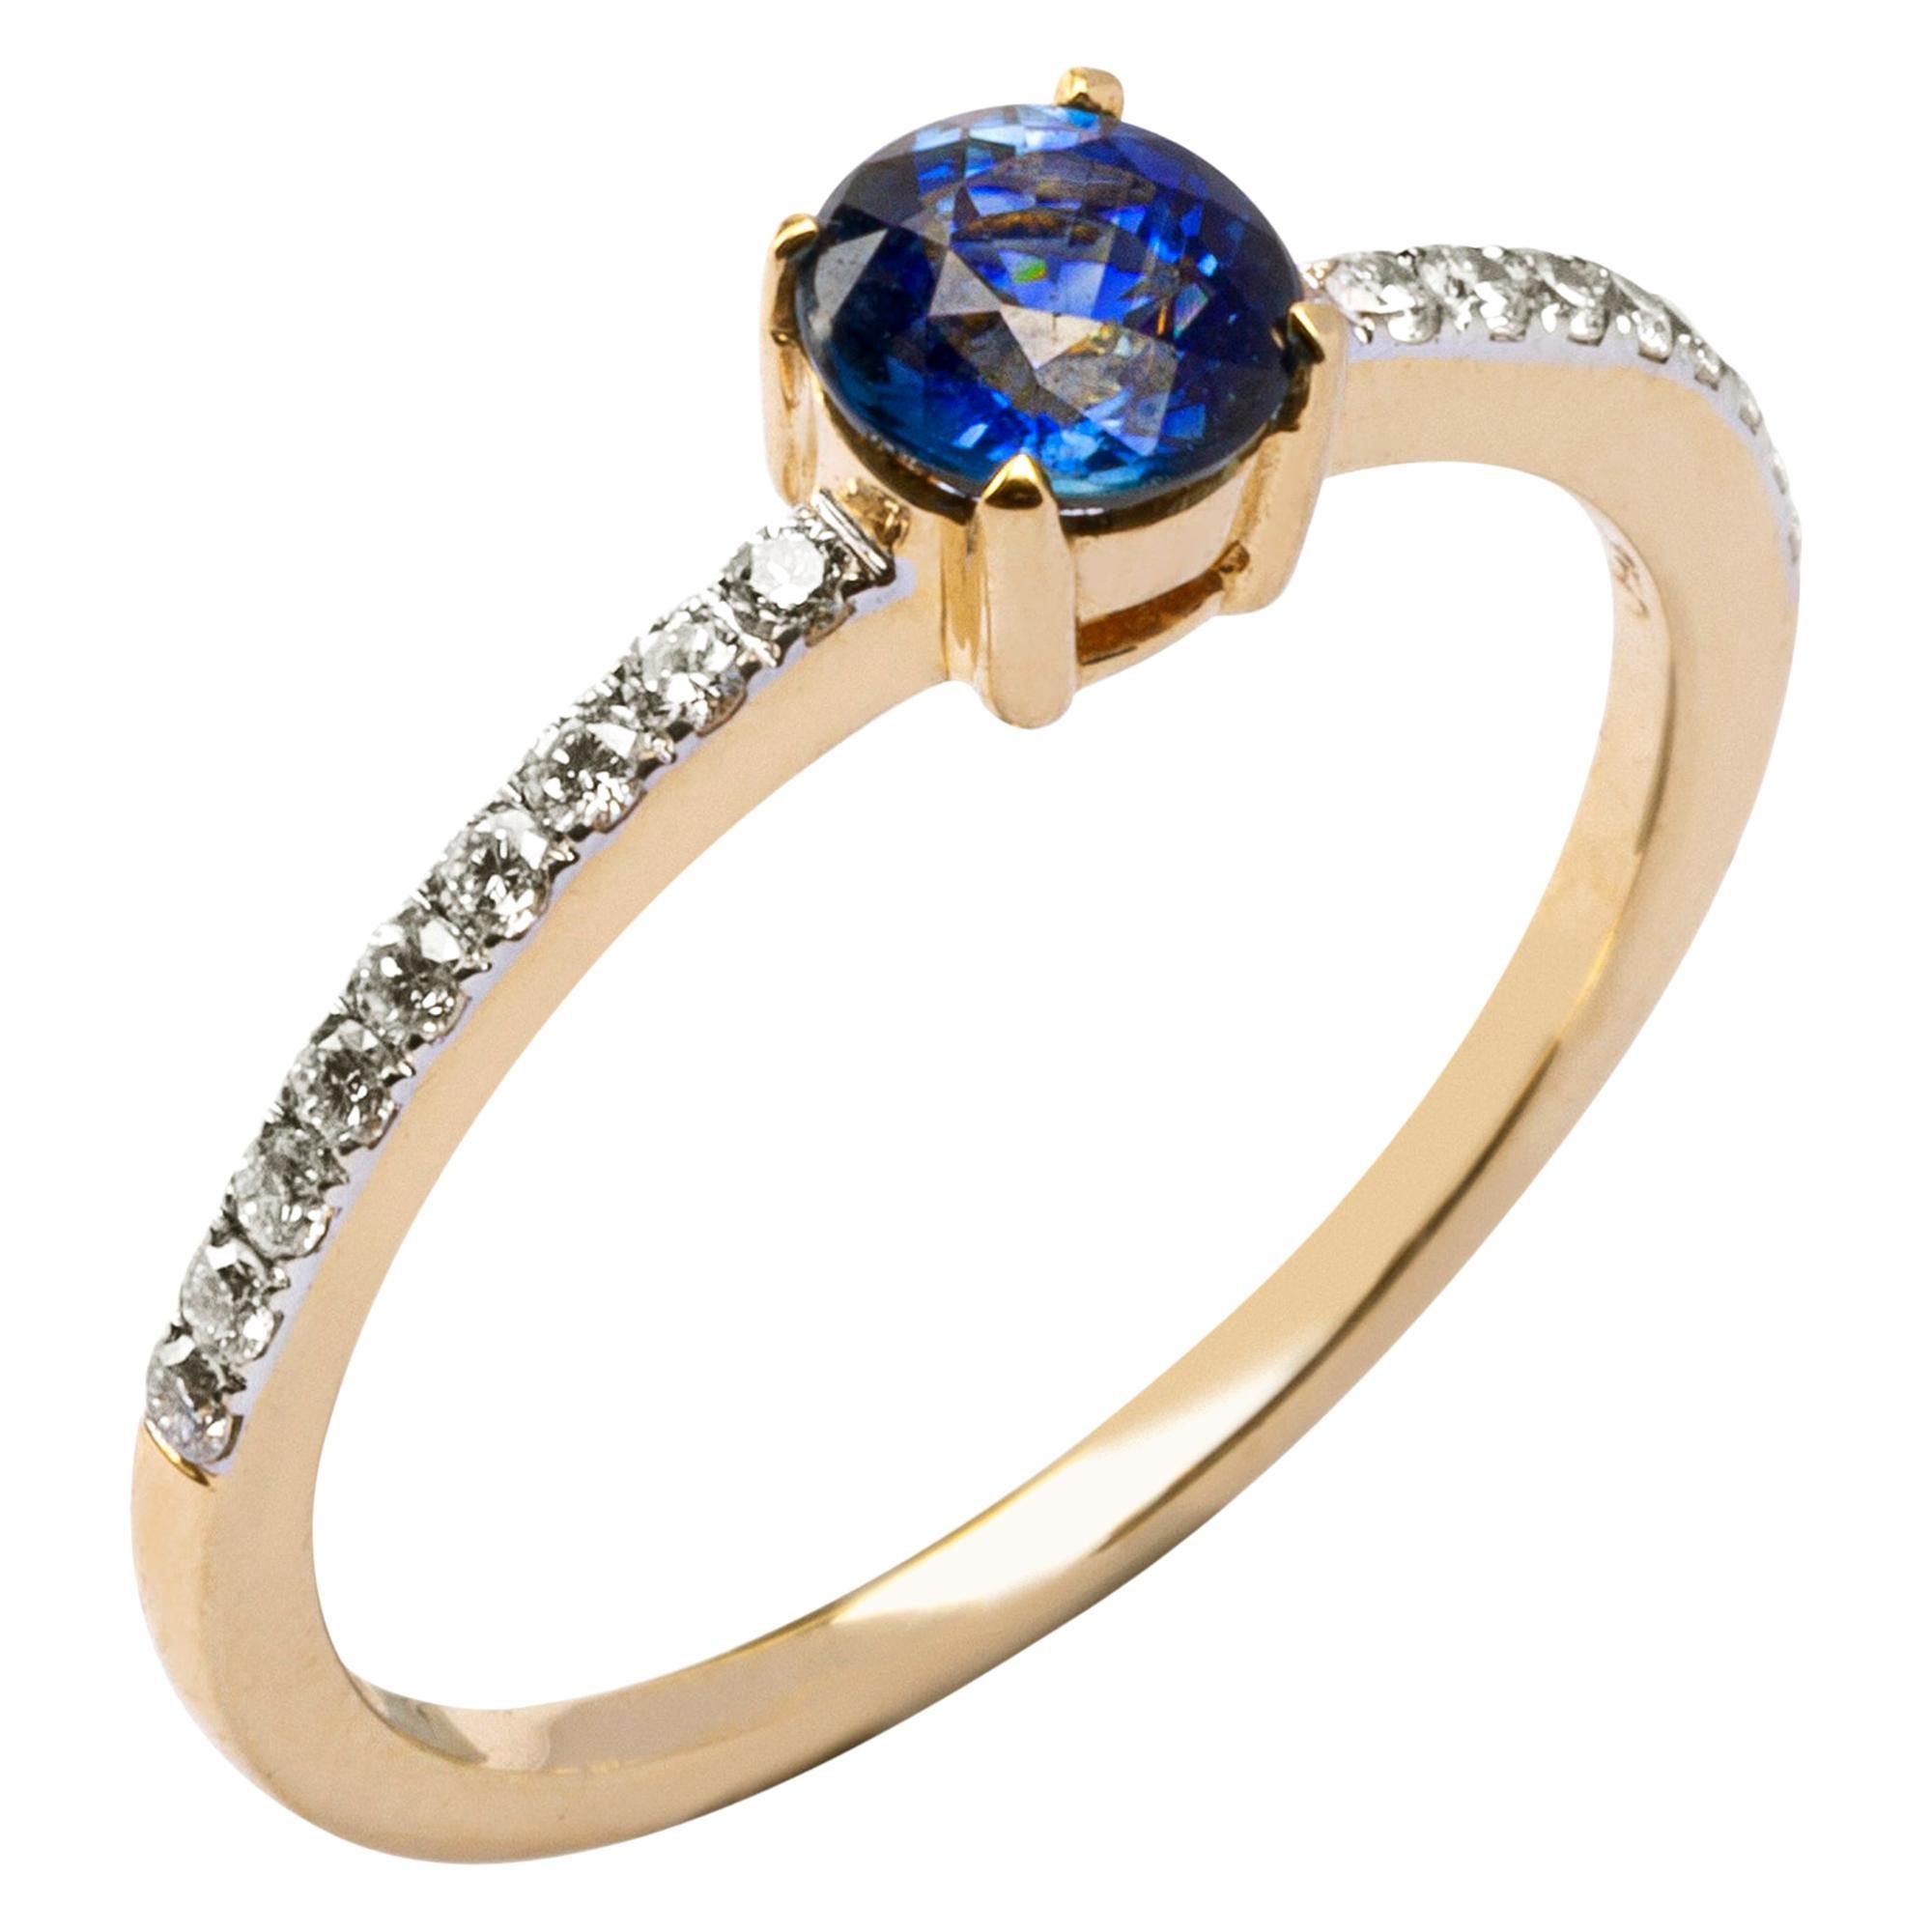 Alex Jona Blue Sapphire White Diamond 18 Karat Yellow Gold Solitaire Ring